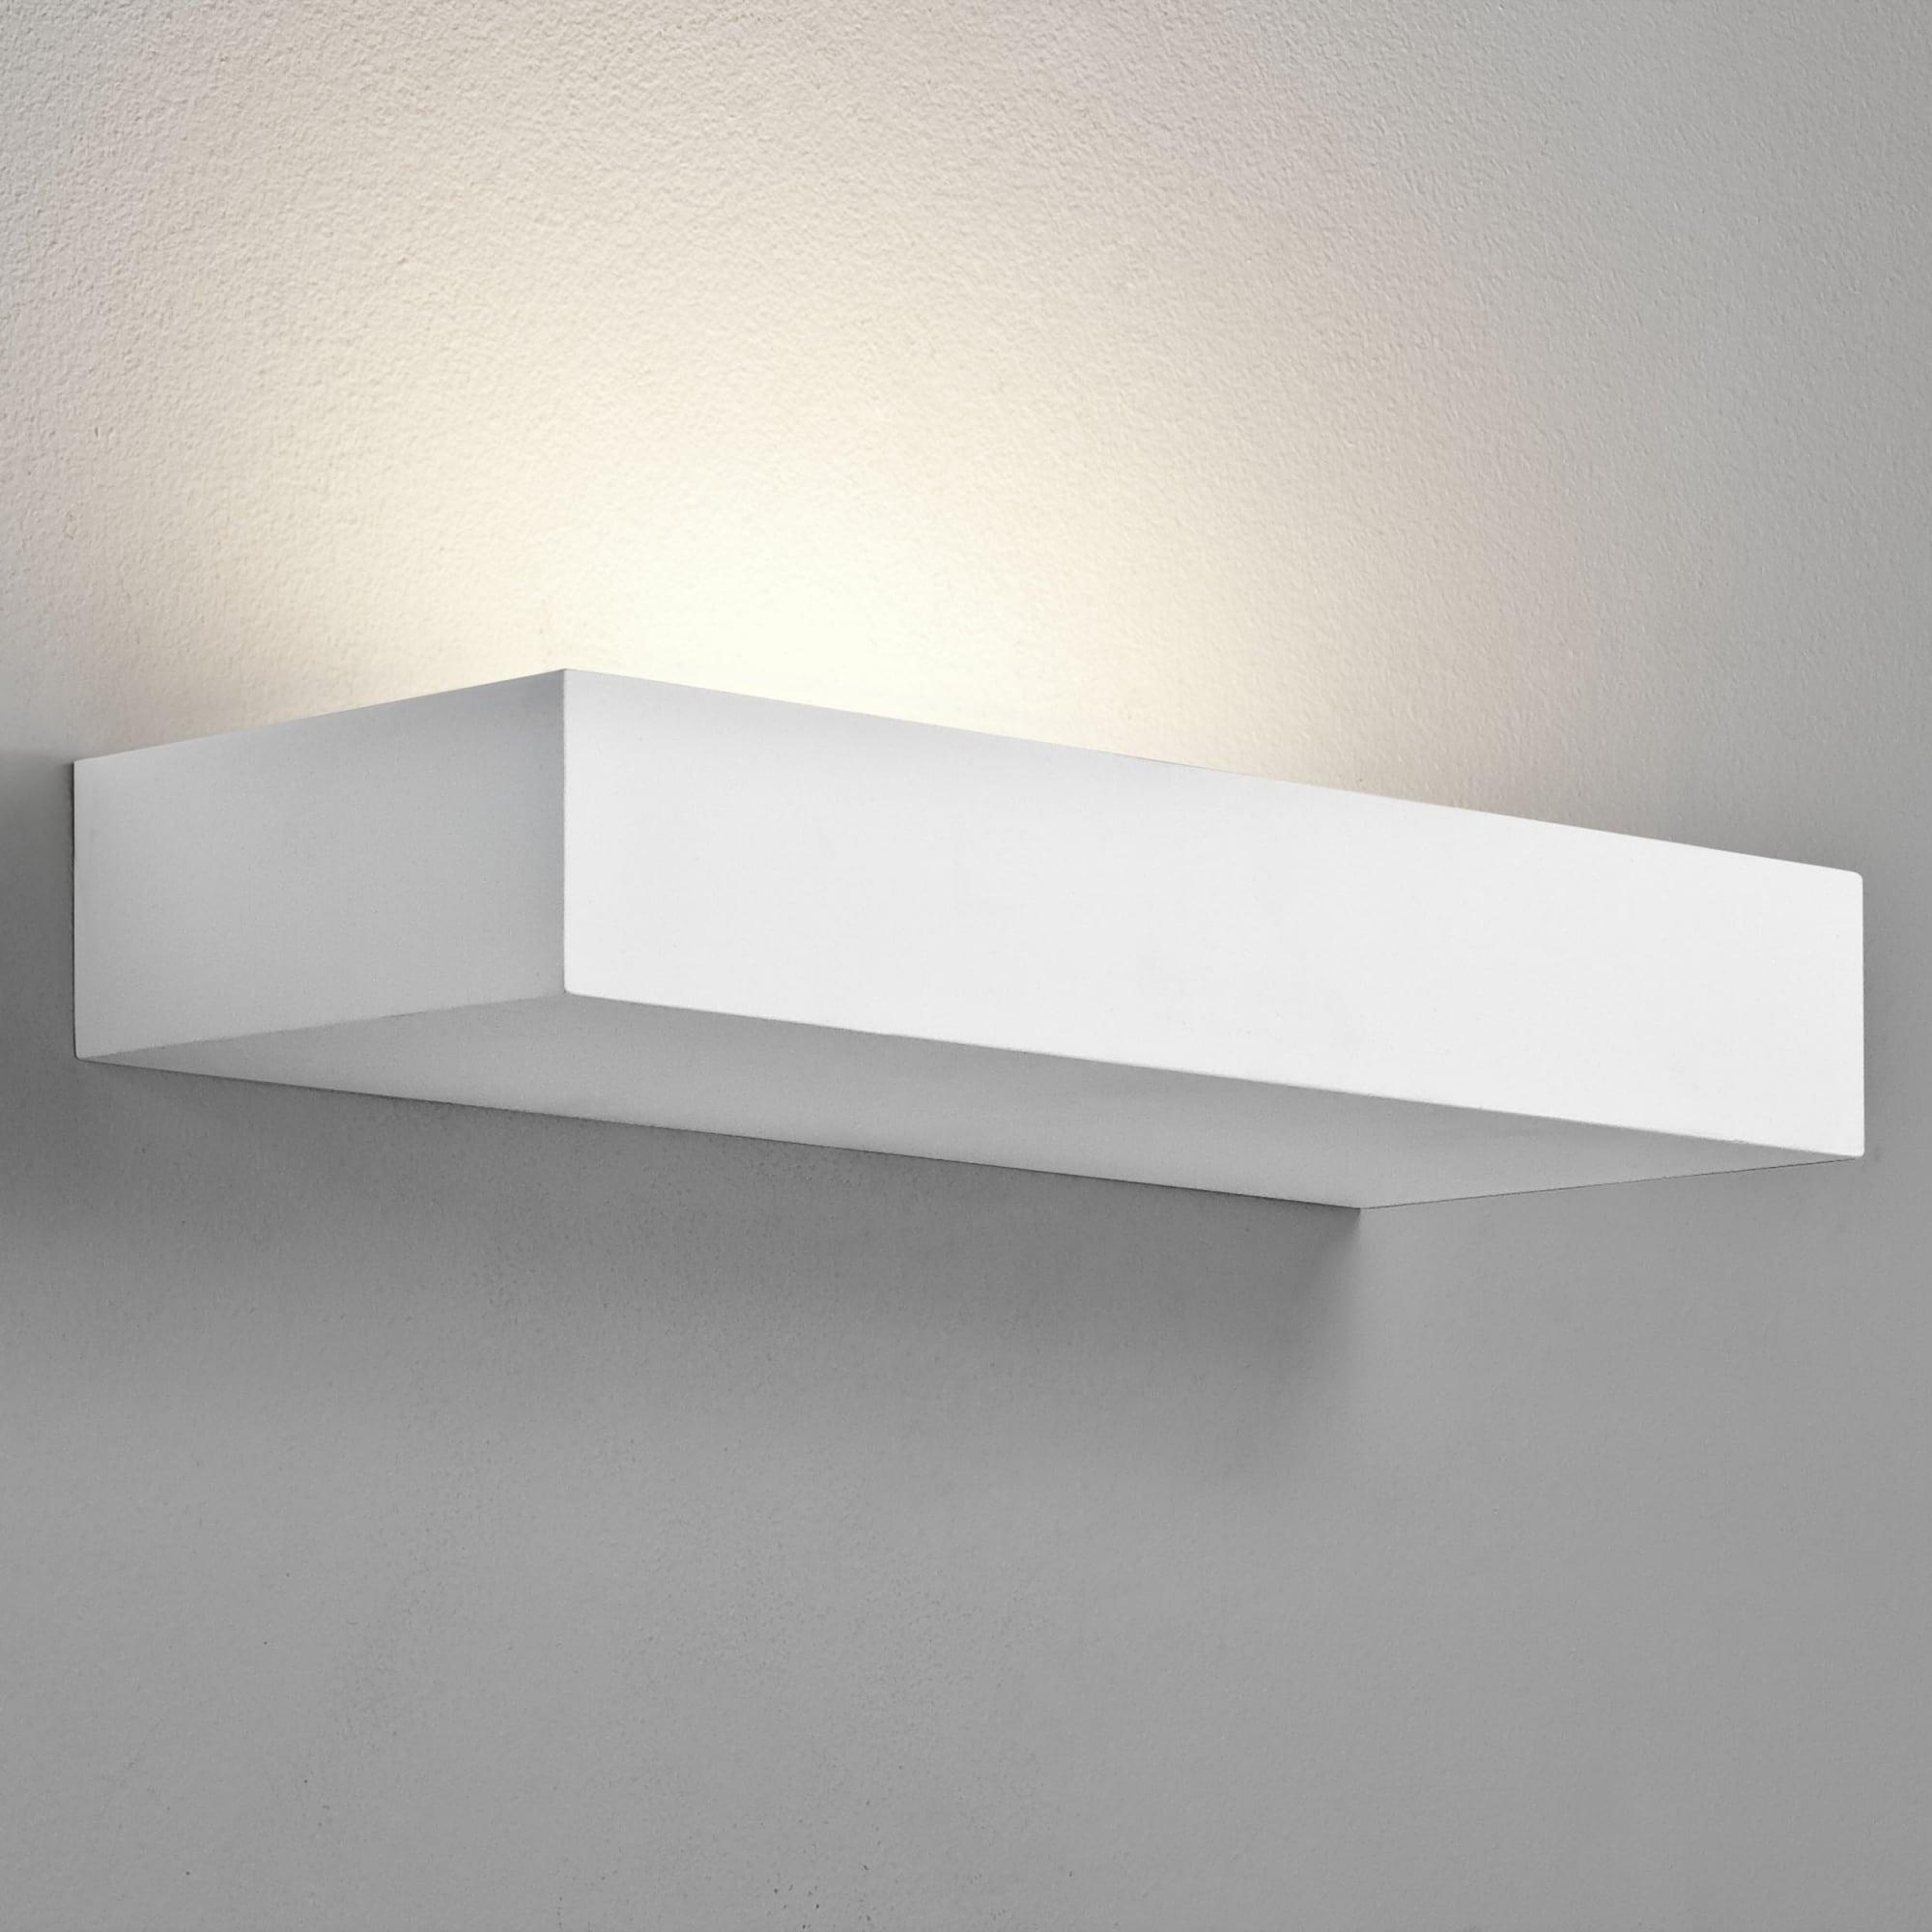 Astro 1187005 Parma Floating Shelf White Led Wall Light Ideas4lighting